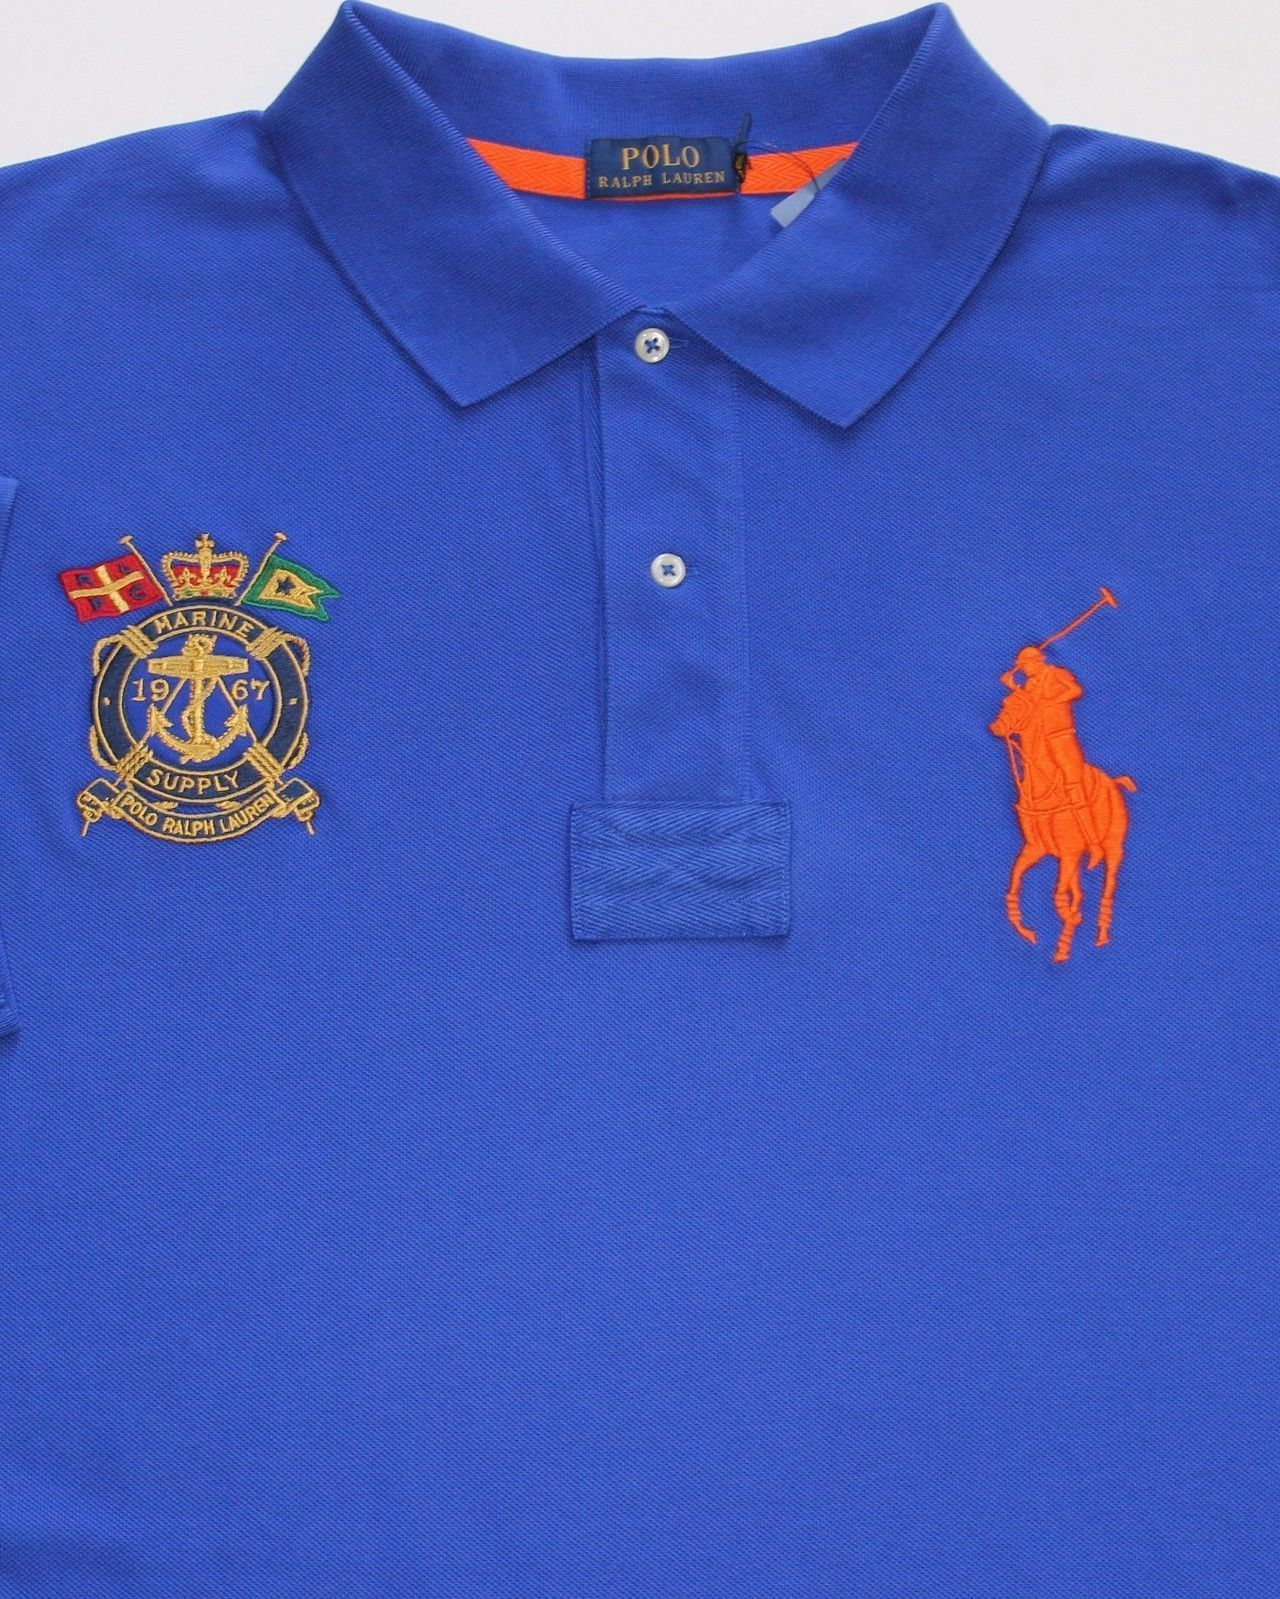 New Polo Ralph Lauren Cotton Blue Big Pony Bleecker Mesh Polo Rugby sz TALL  3XLT  96fc0f0d9